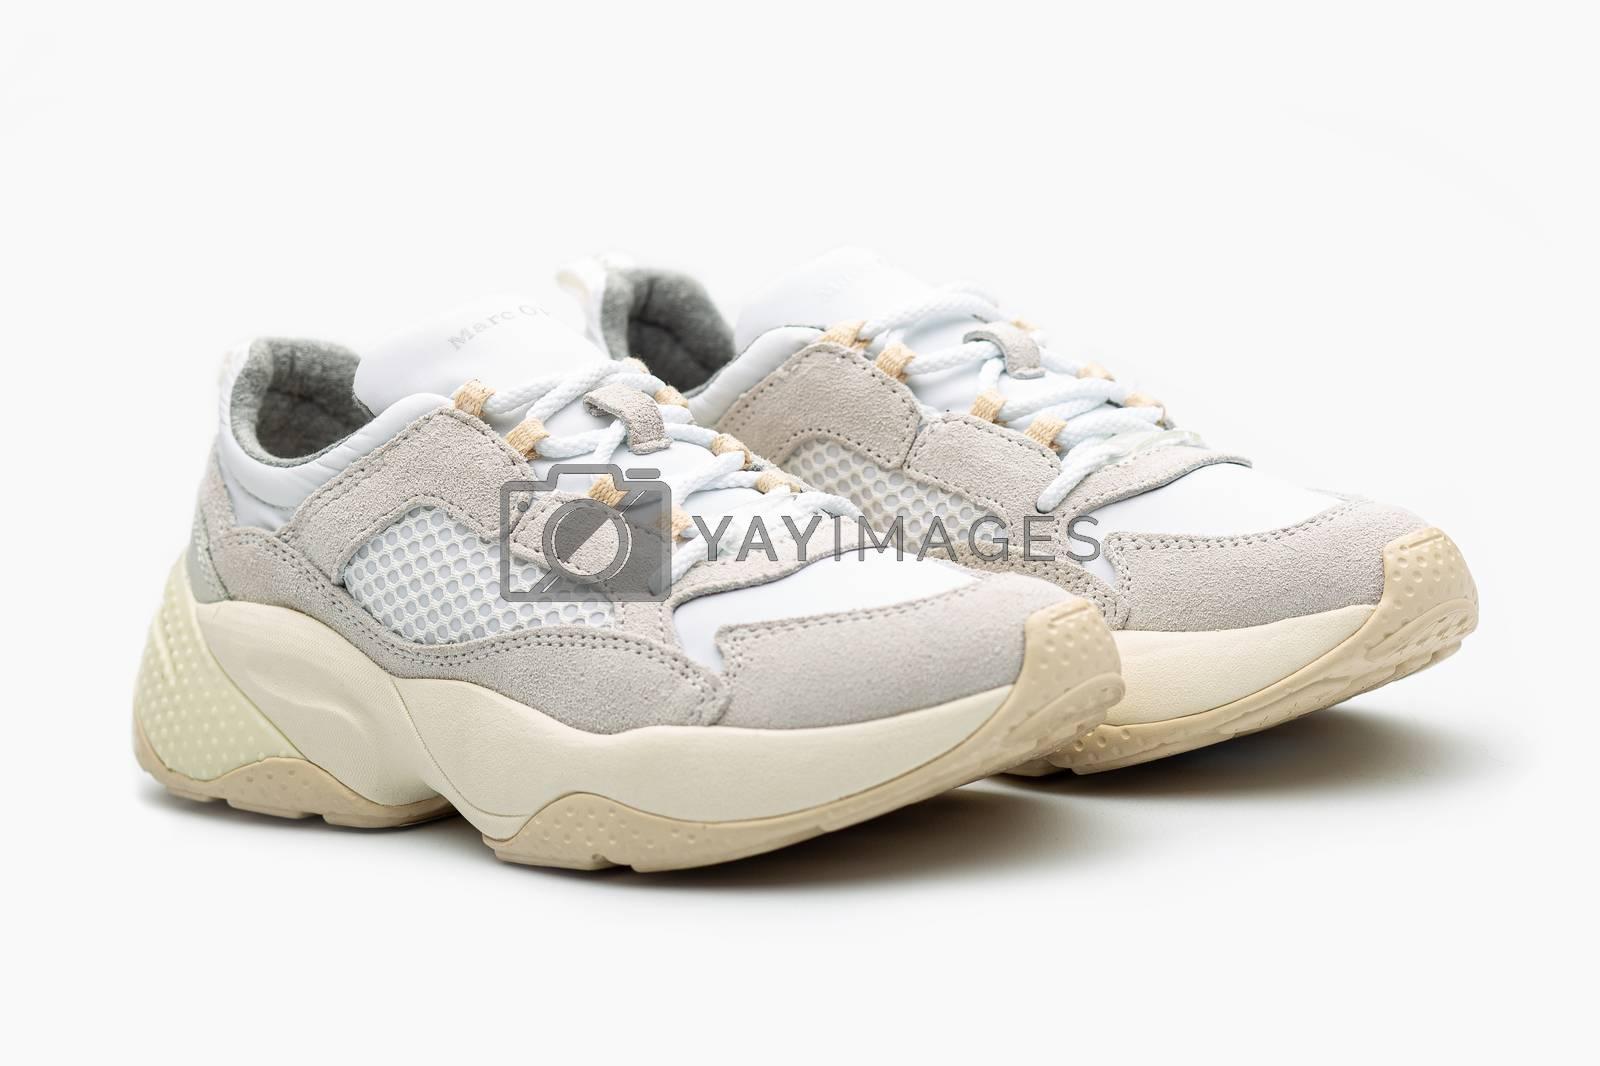 sneaker shoes woman footwear white modern fashion clothing by Tim Wit